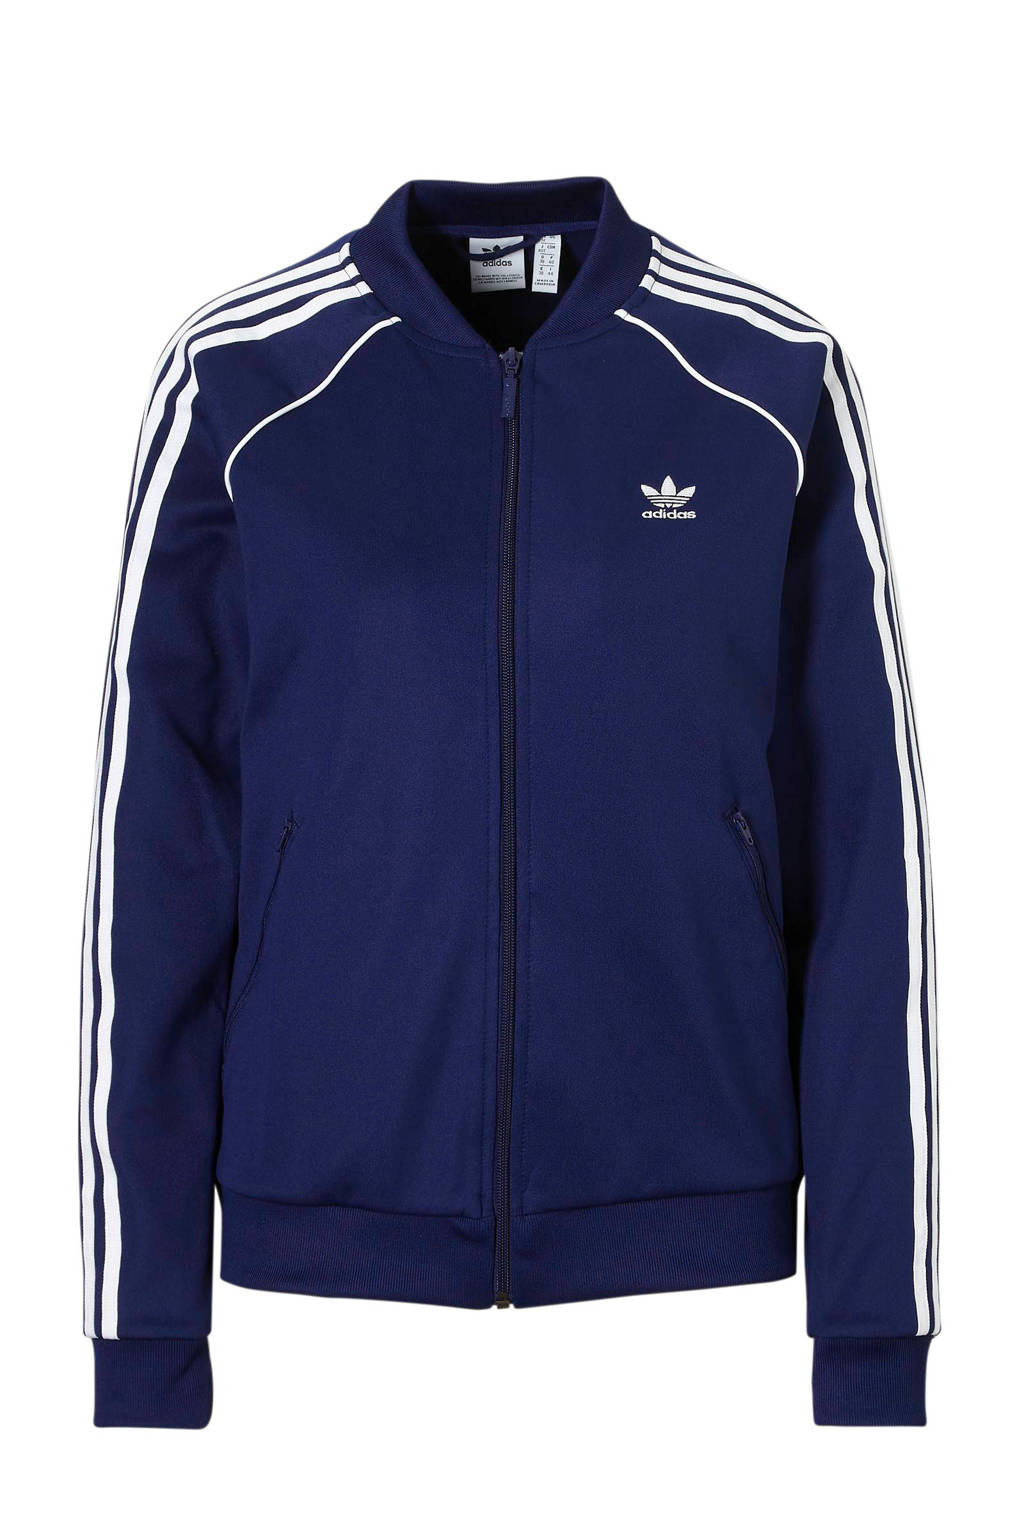 7e3e0d180ca adidas originals vest donkerblauw, Donkerblauw/wit